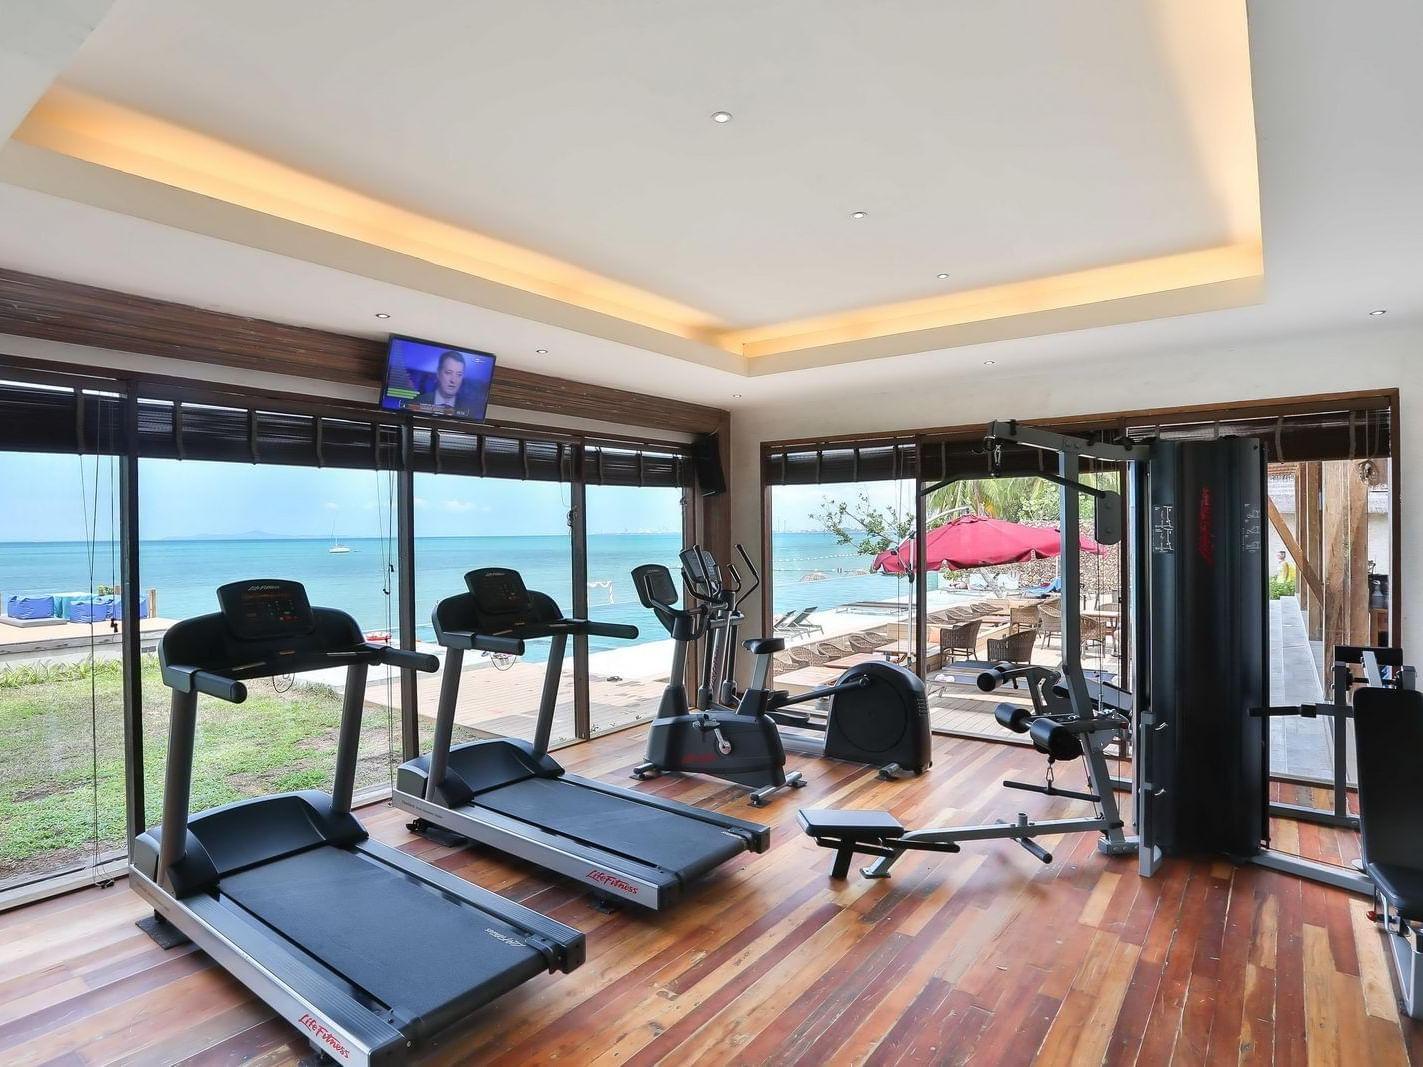 Equipments of Gym at U Hotels and Resorts